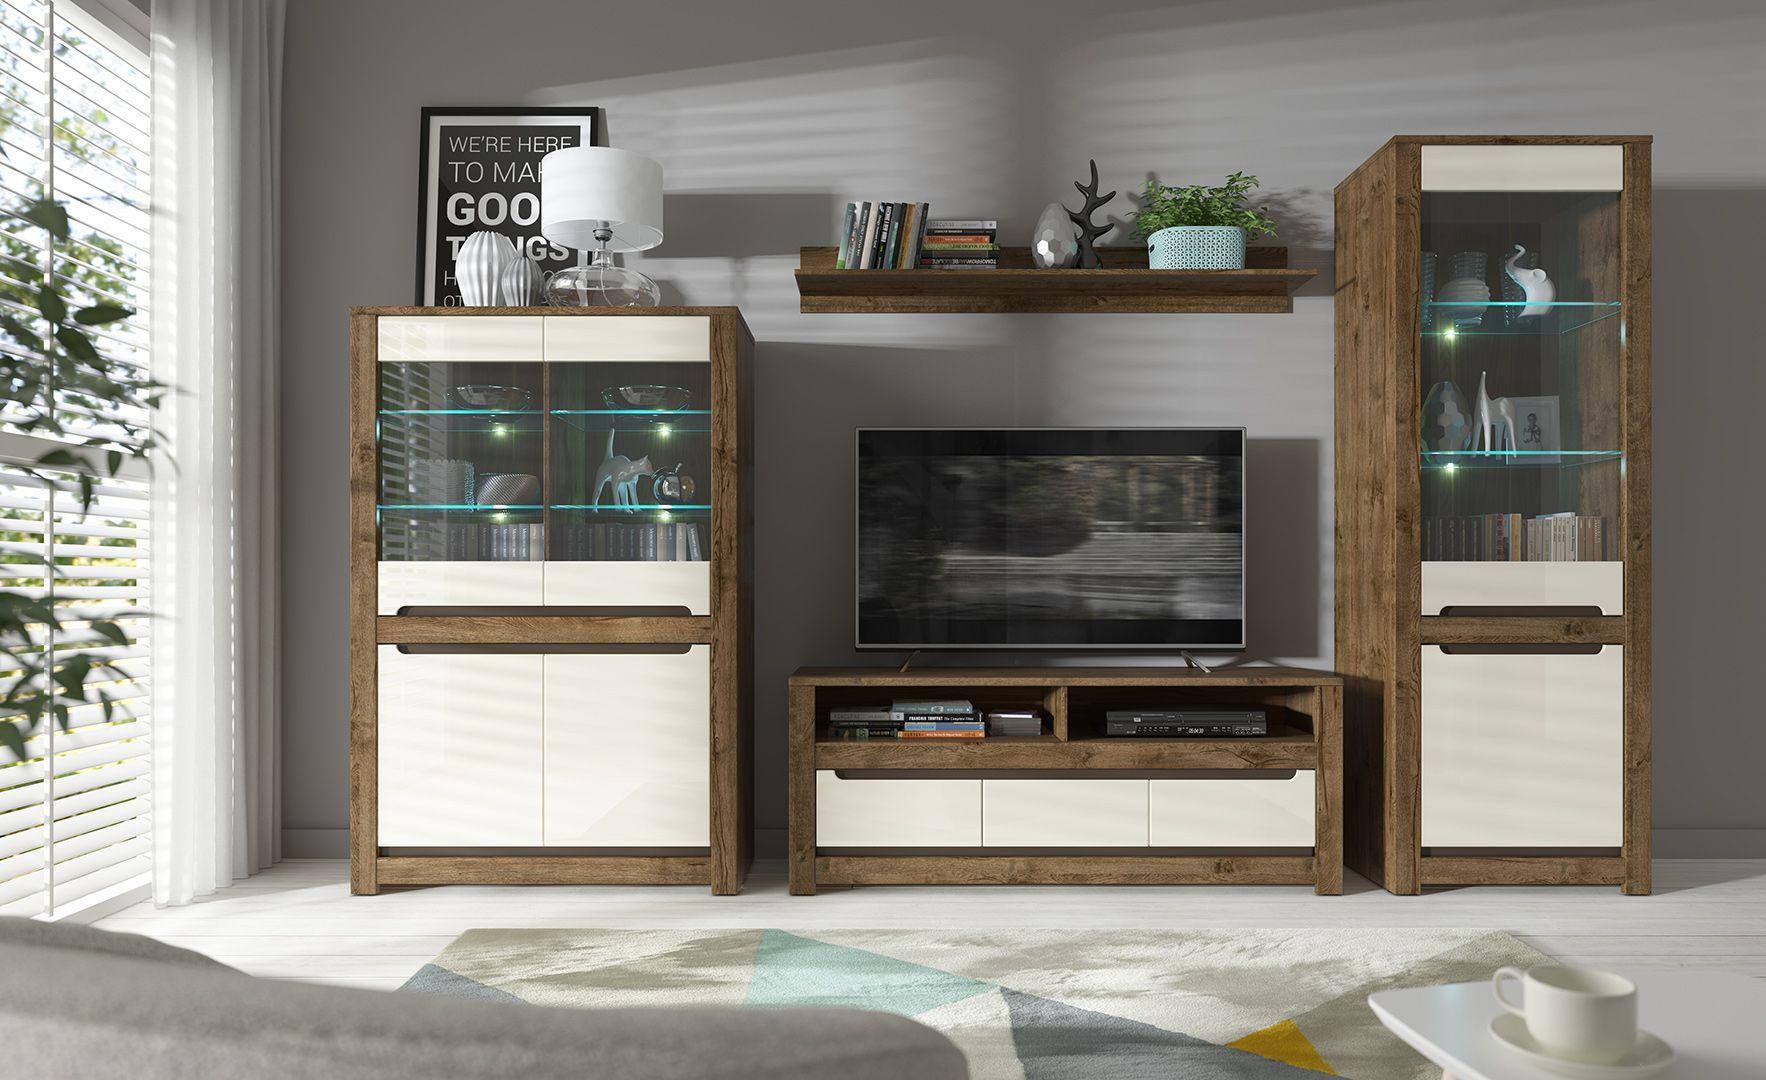 Cream Gloss Dark Oak Living Room Furniture Retro Modern Cabinet Storage Shelf Displa Dark Oak Living Room Furniture Living Room And Dining Room Decor Furniture